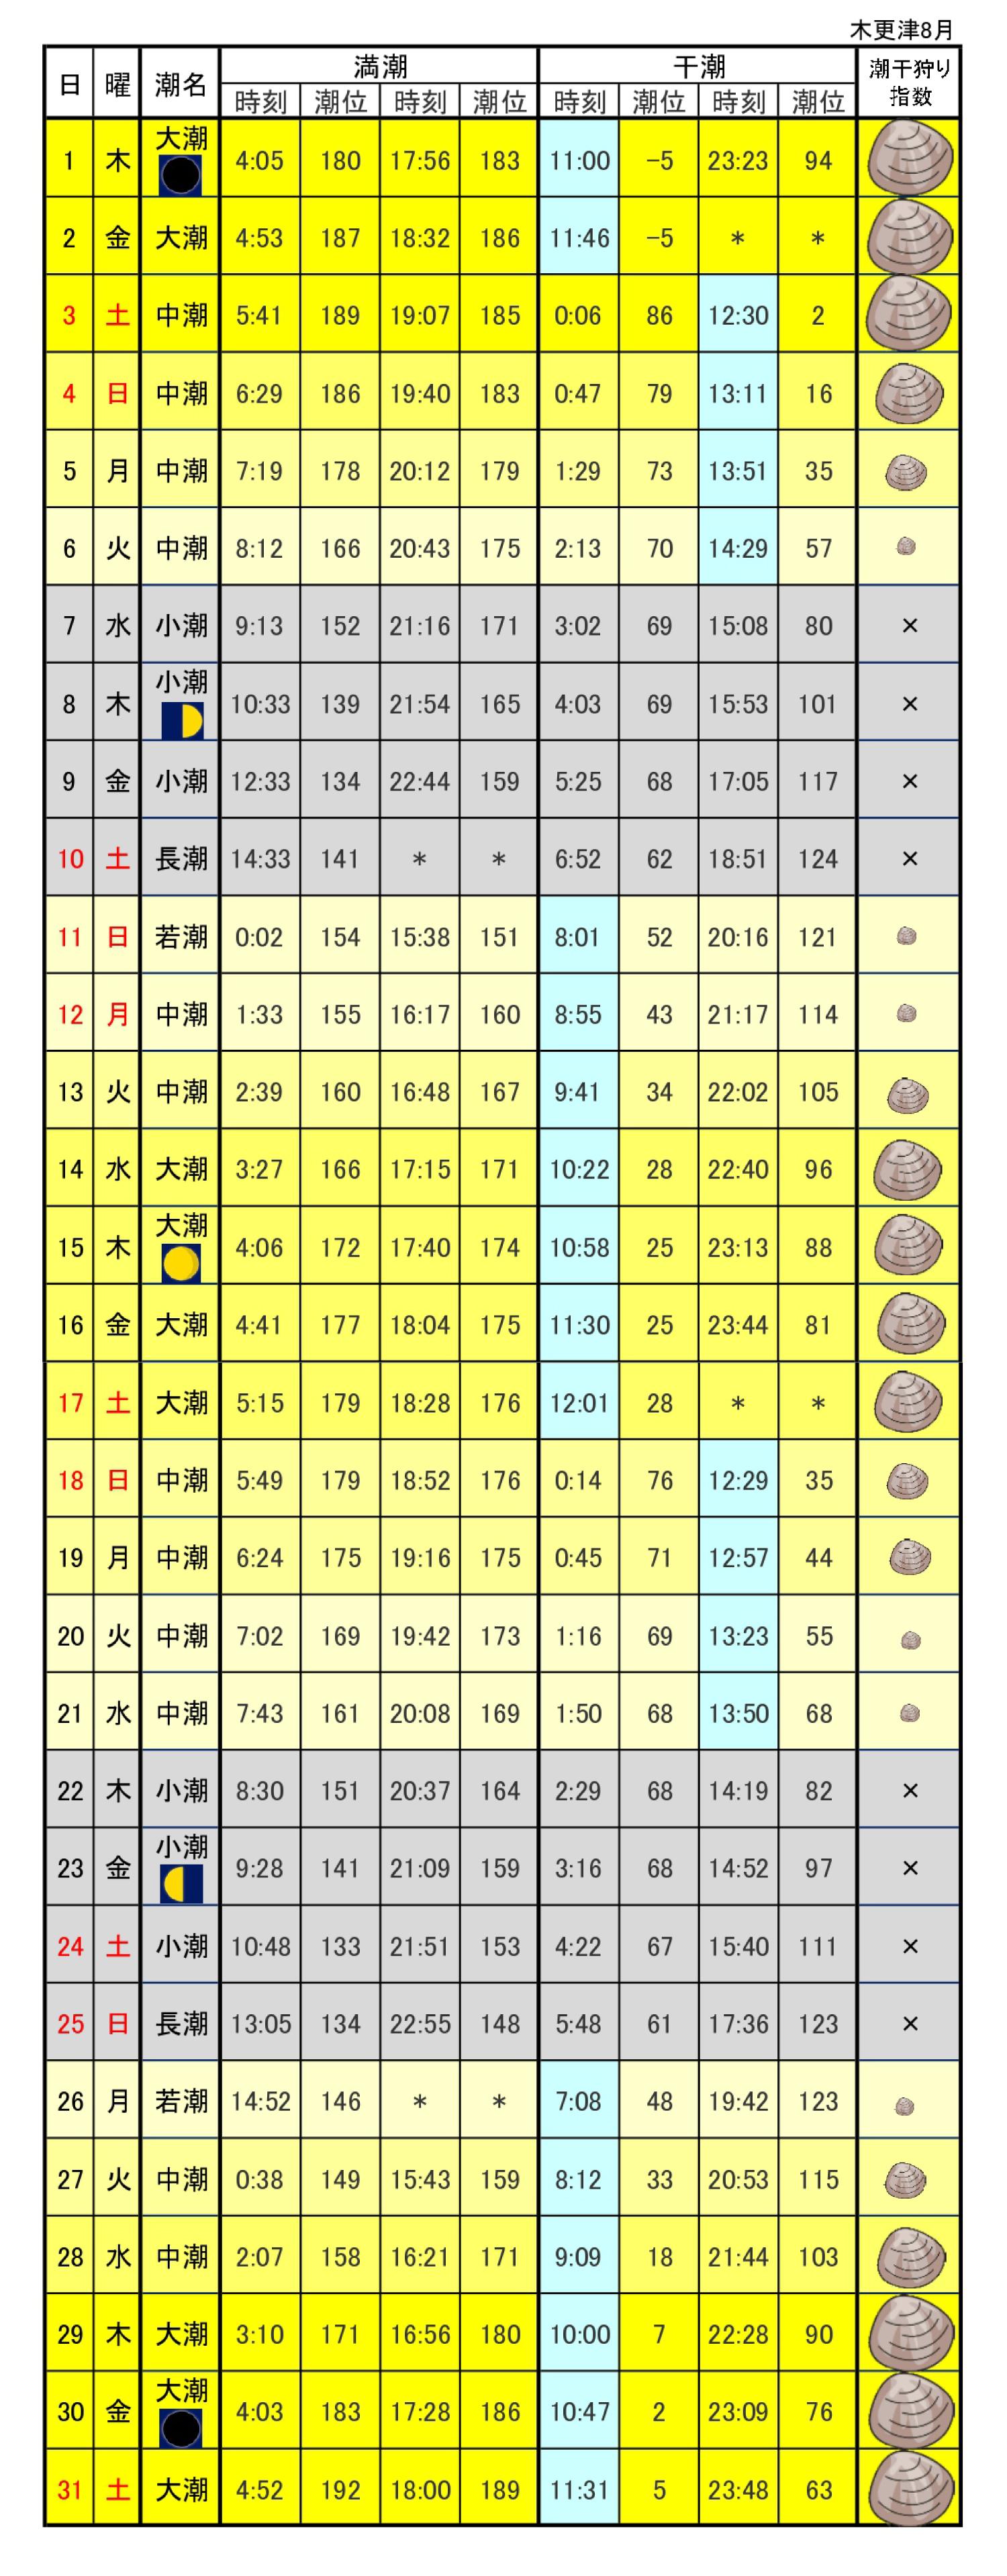 木更津潮干狩り潮位表2019年8月